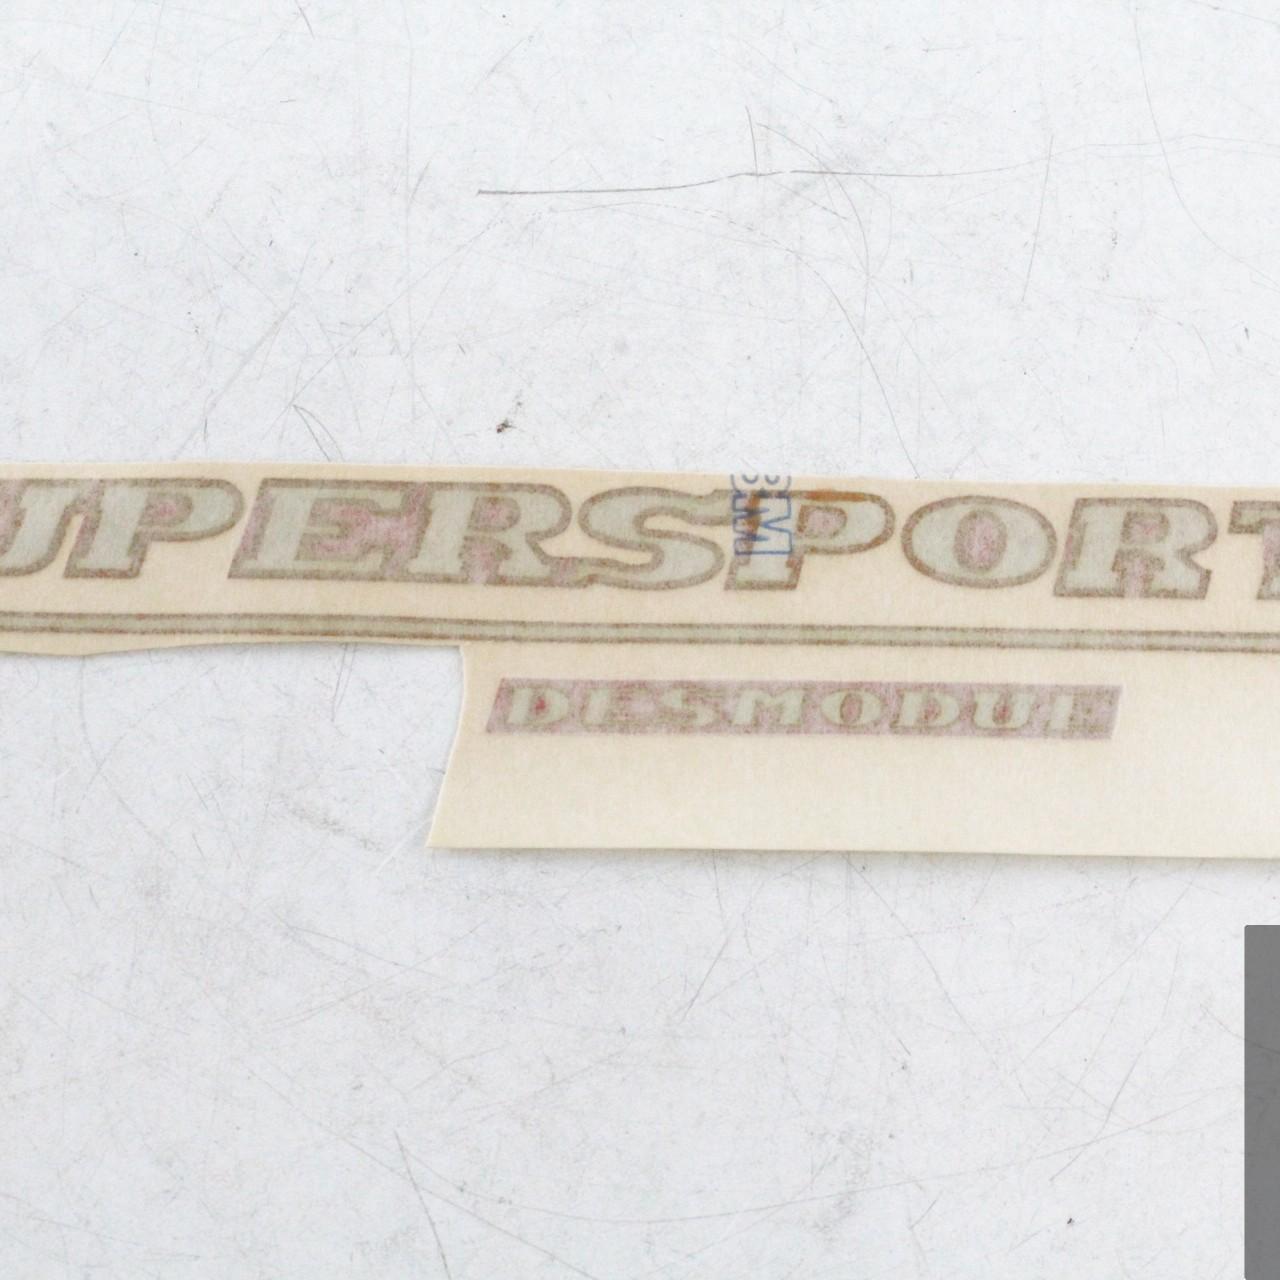 Adesivo carena sinistra SUPERSPORT DESMODUE ducati supersport SS 600 750